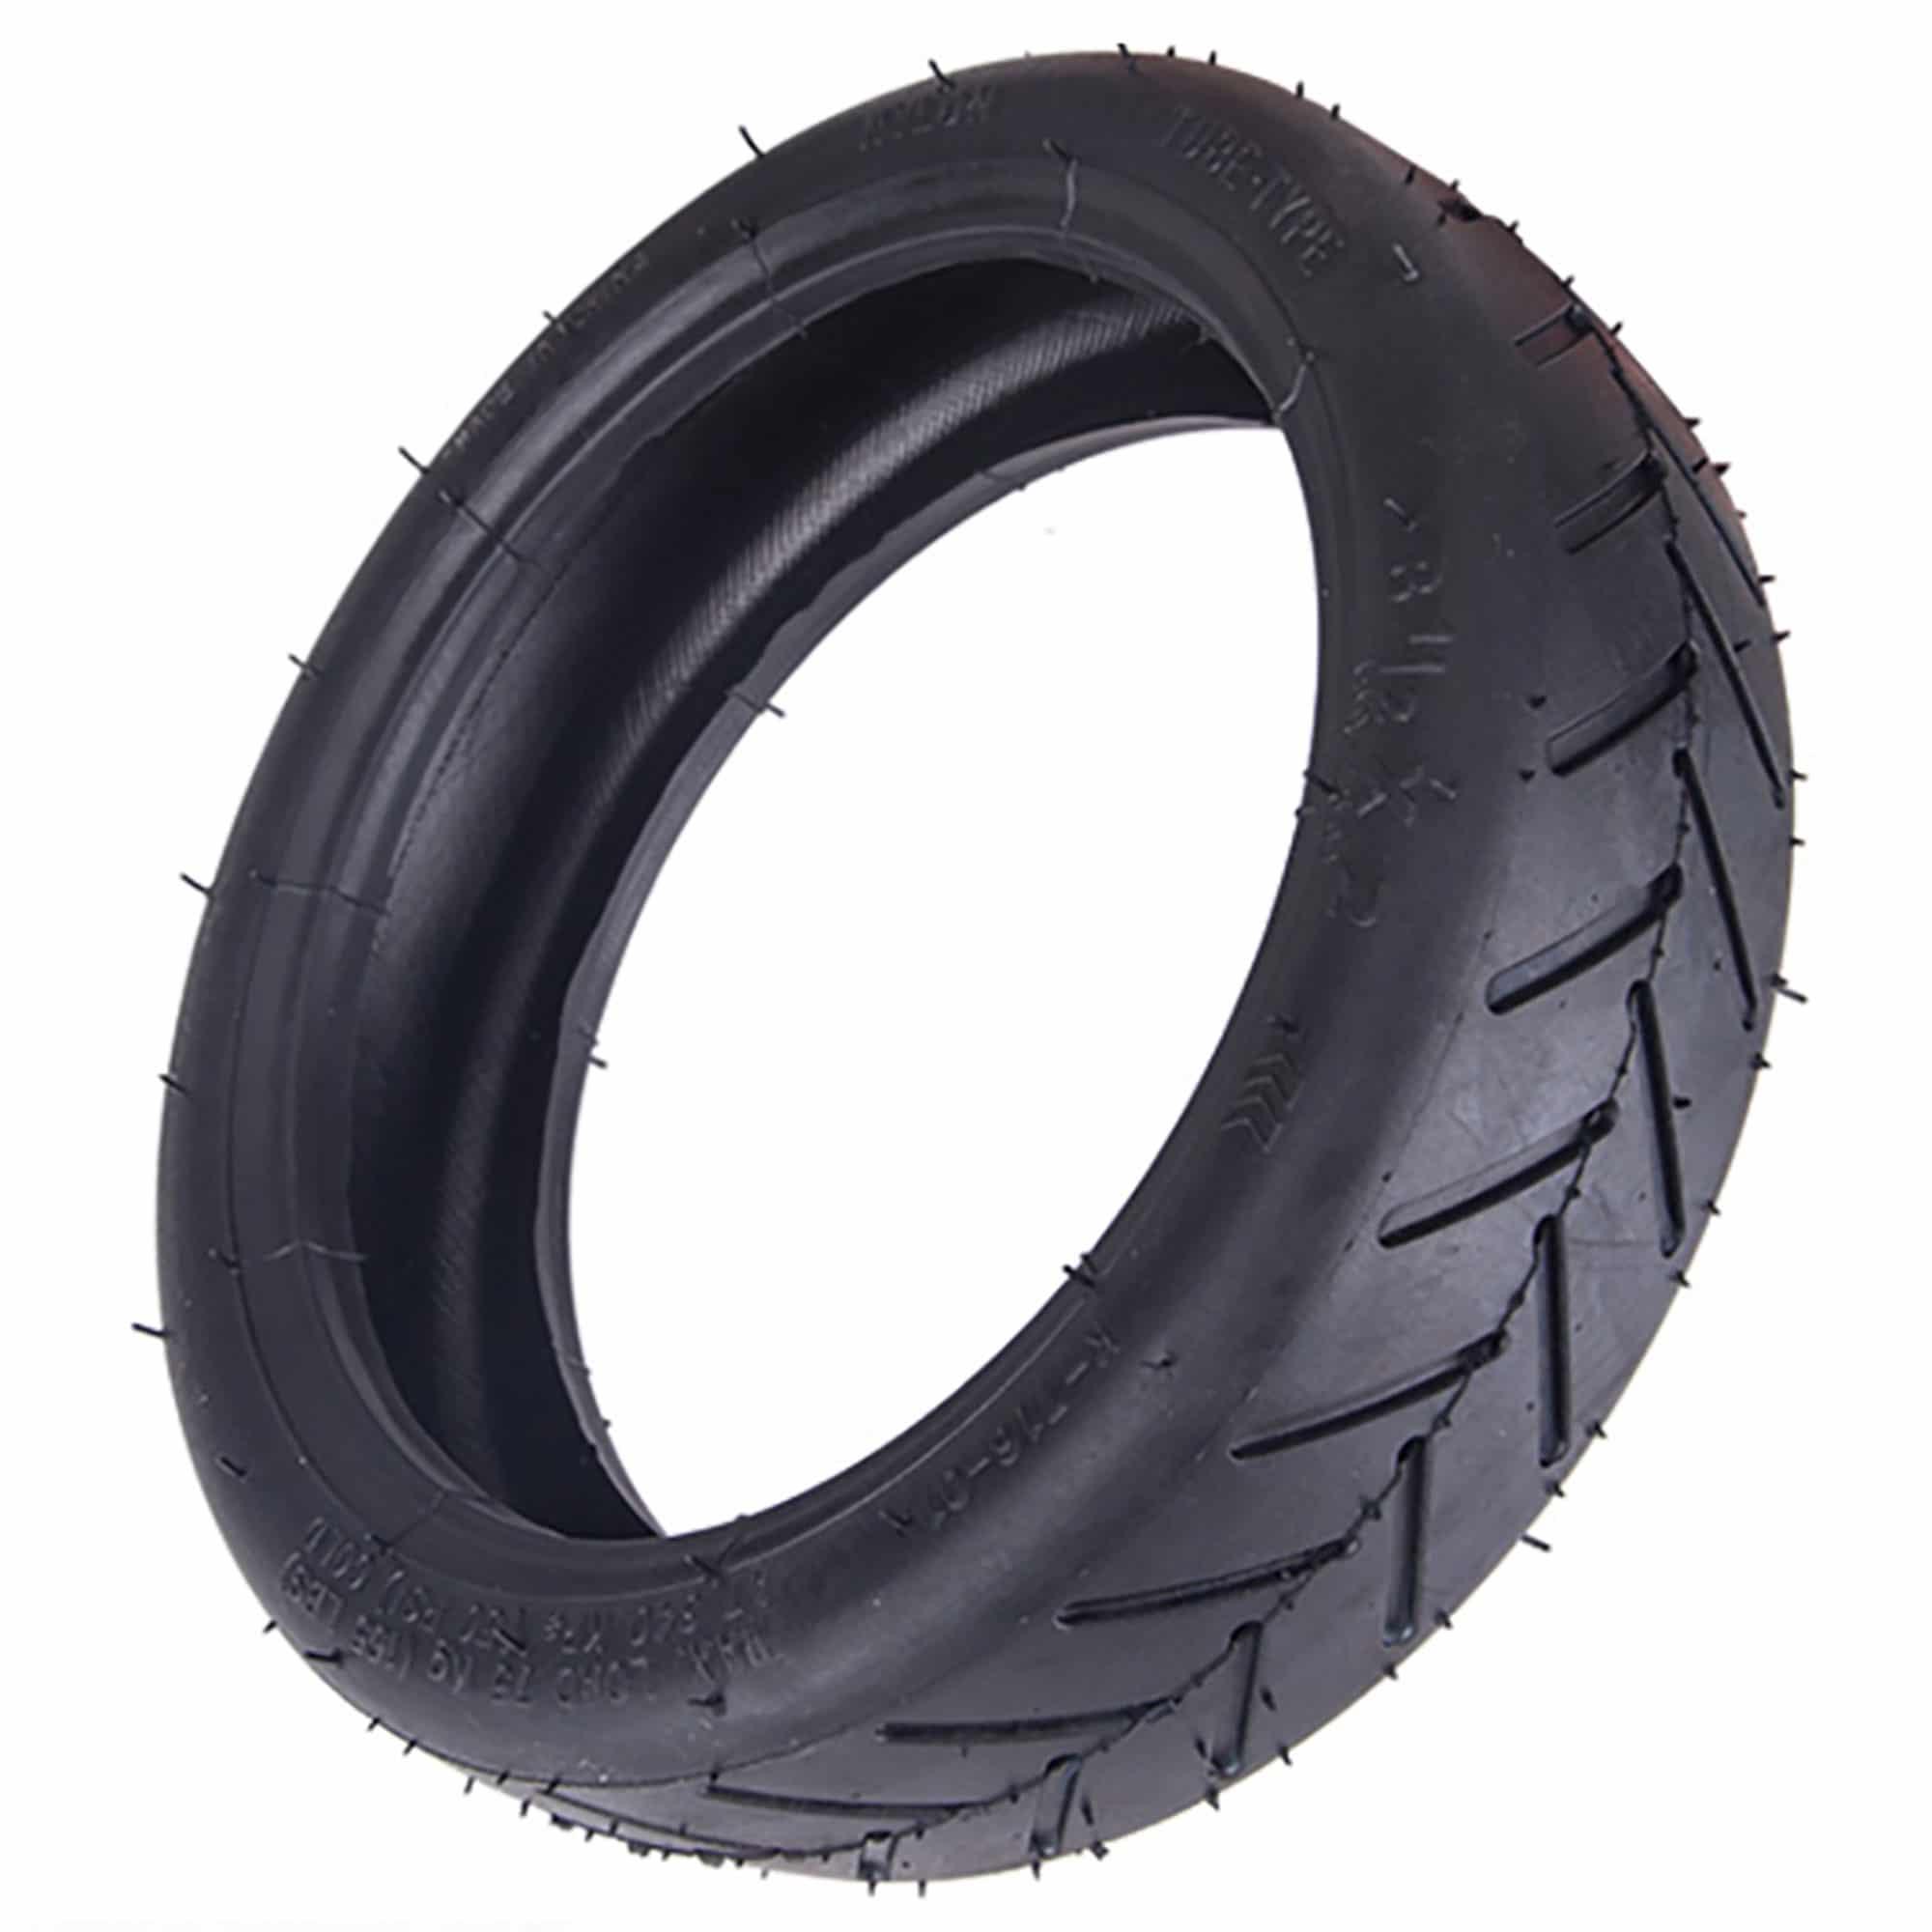 neumático sólido - Zwheel